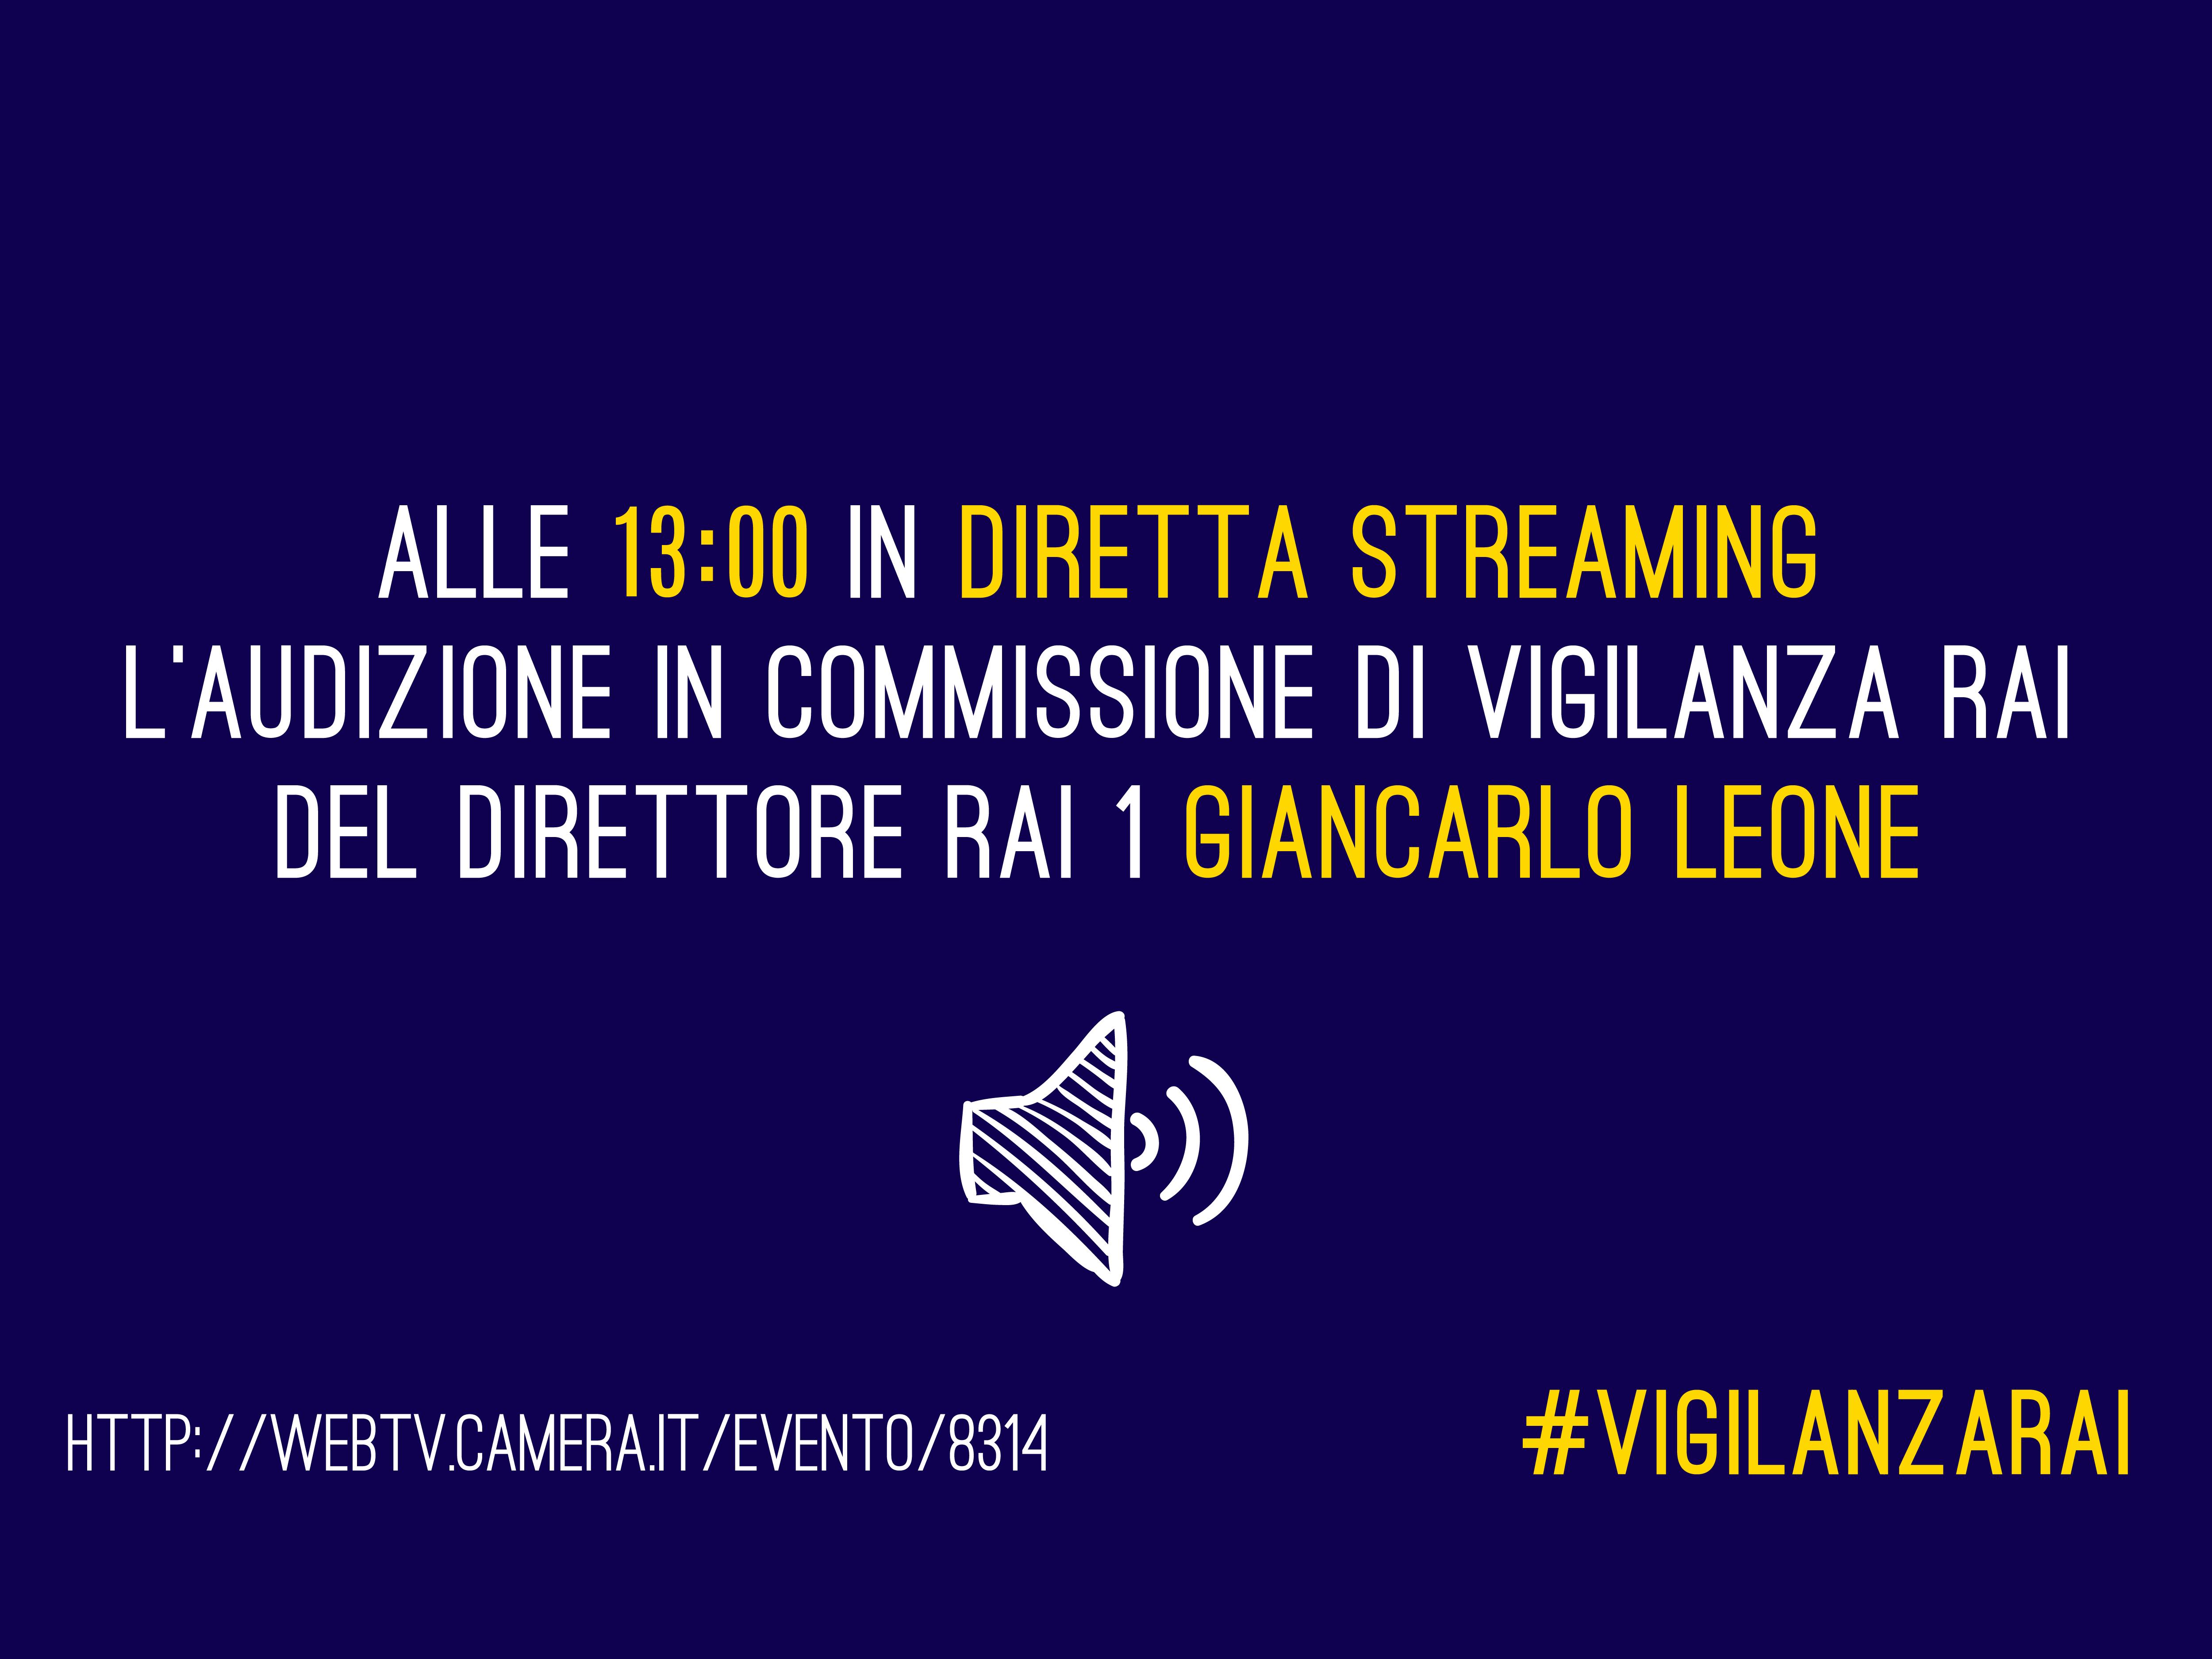 Bruno vespa roberto fico for Diretta tv camera deputati